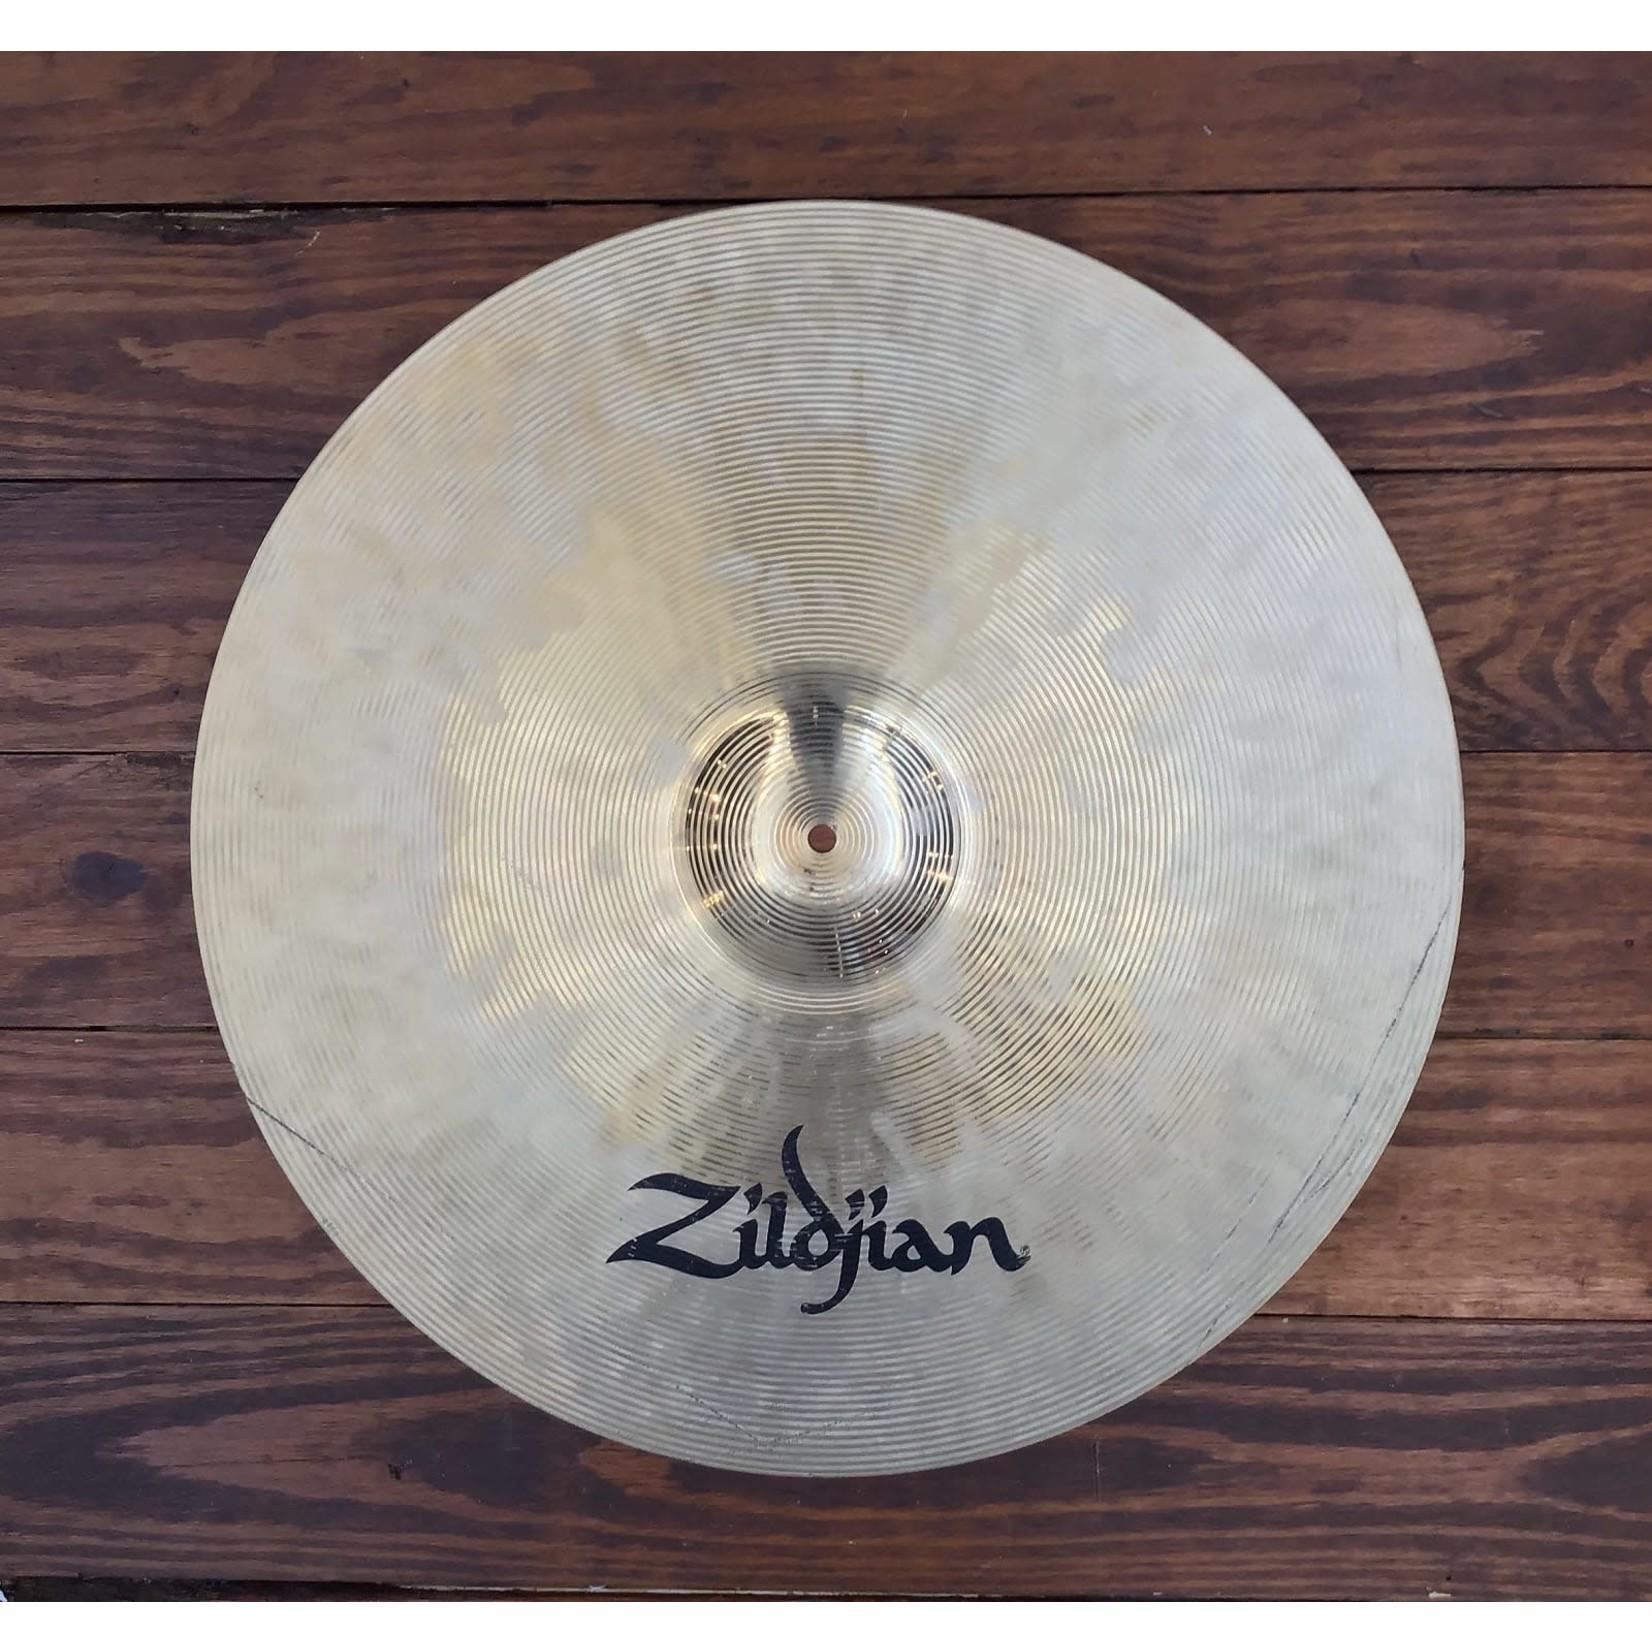 "Zildjian USED Zildjian Sound Lab Limited Edition Project 391 22"" Ride Cymbal"